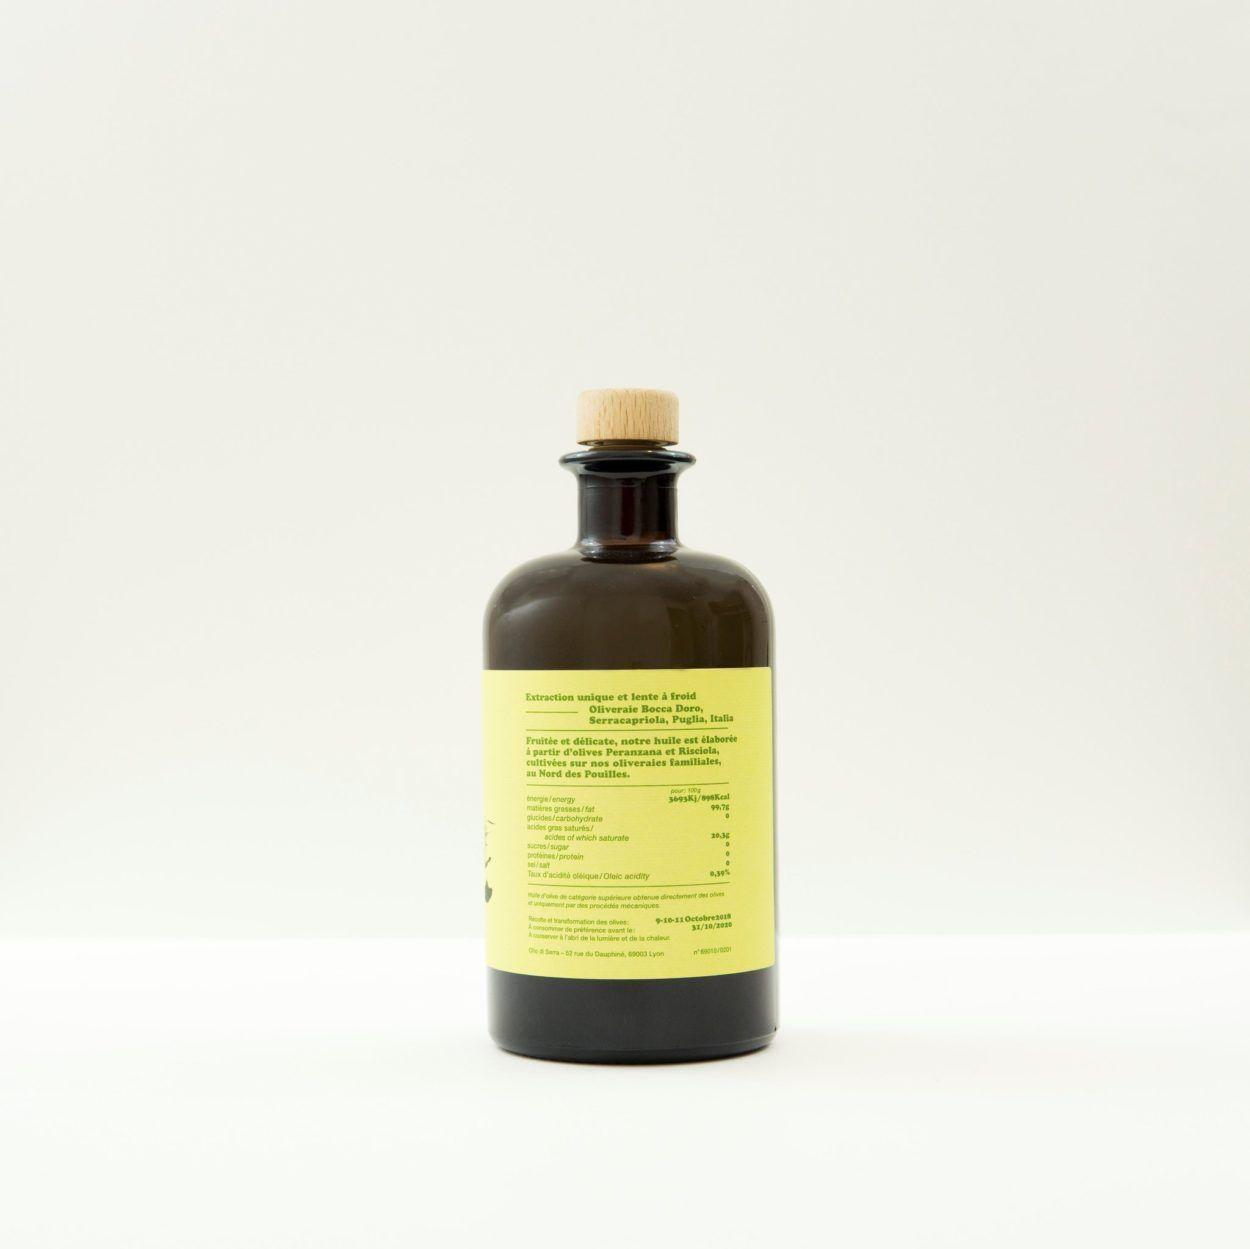 Huile olives haut de gamme olio di serra Bottiglia